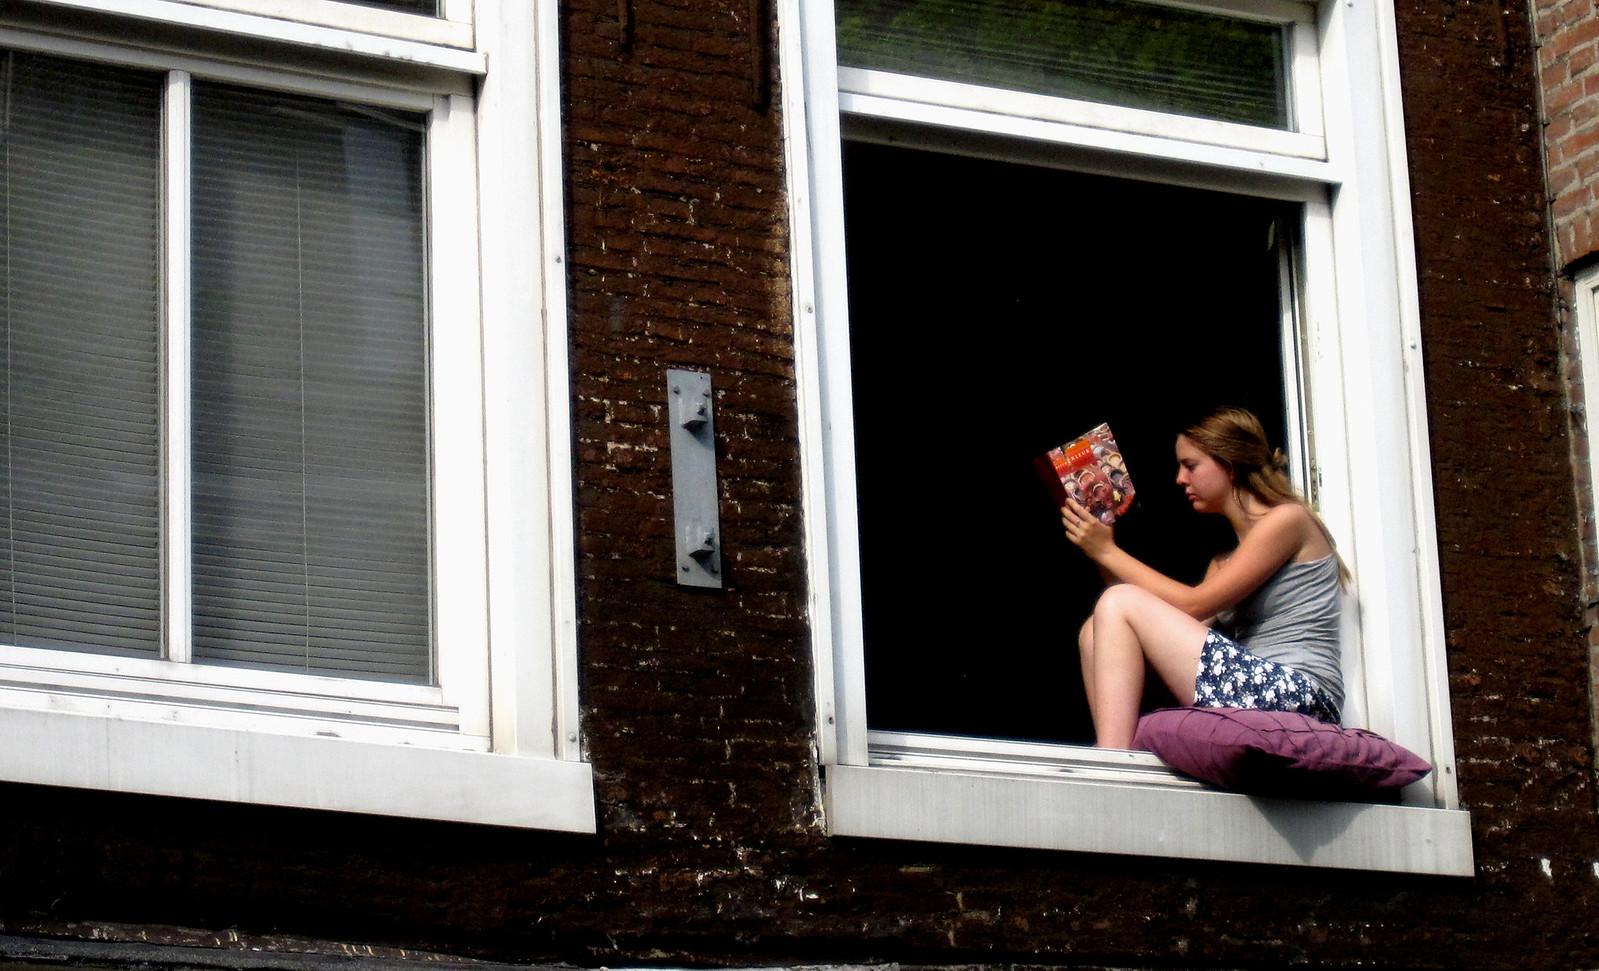 Amsterdam 472